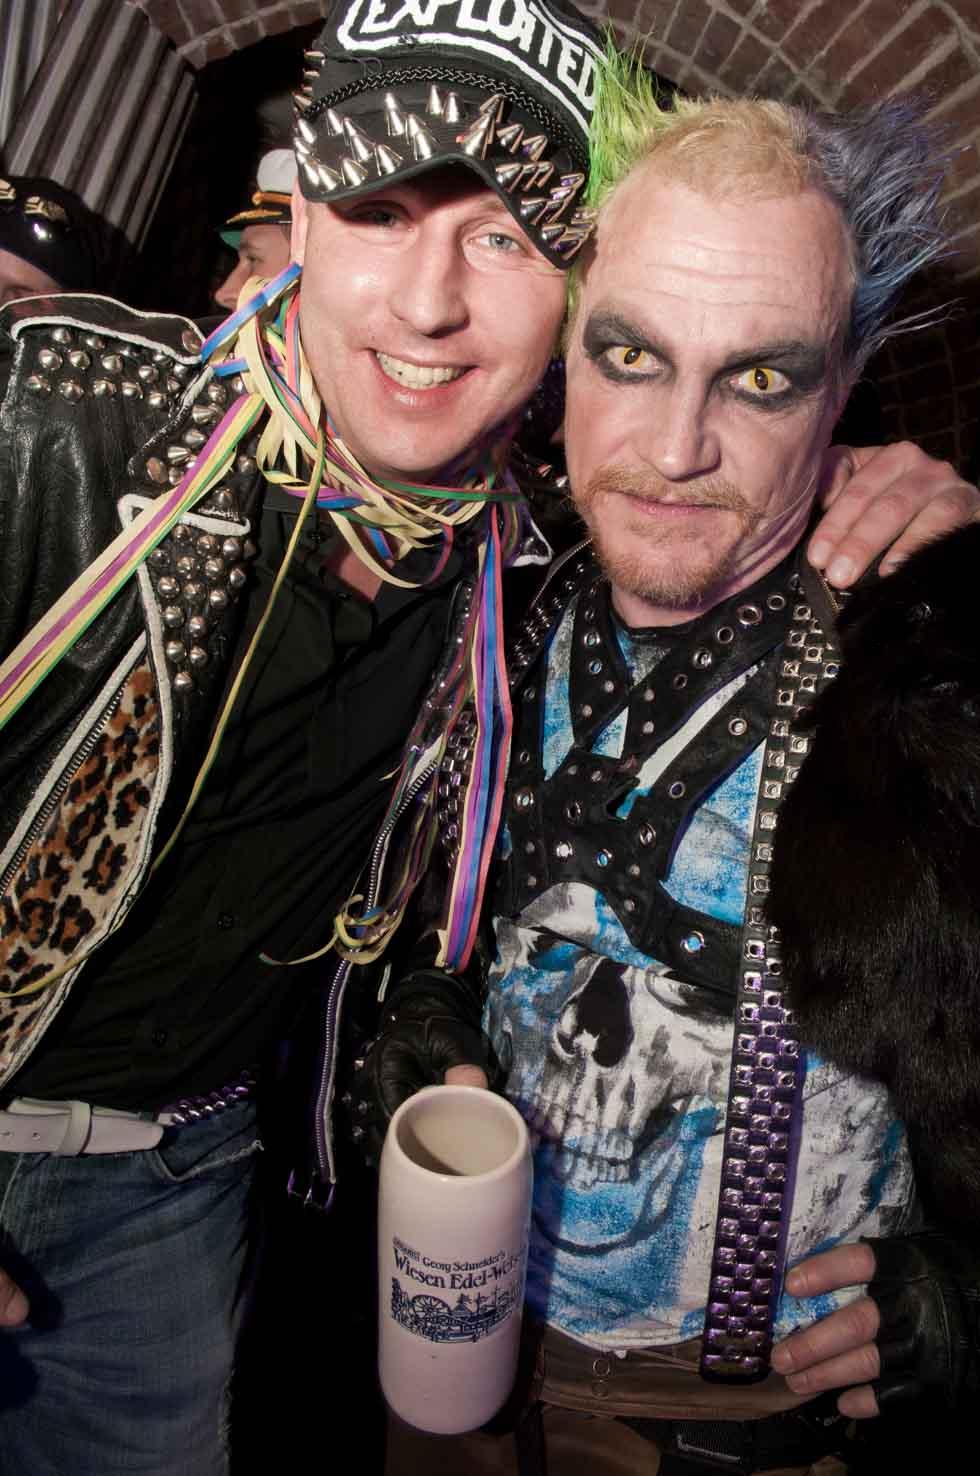 zum-schneider-nyc-2012-karneval-apocalyptika-3507.jpg